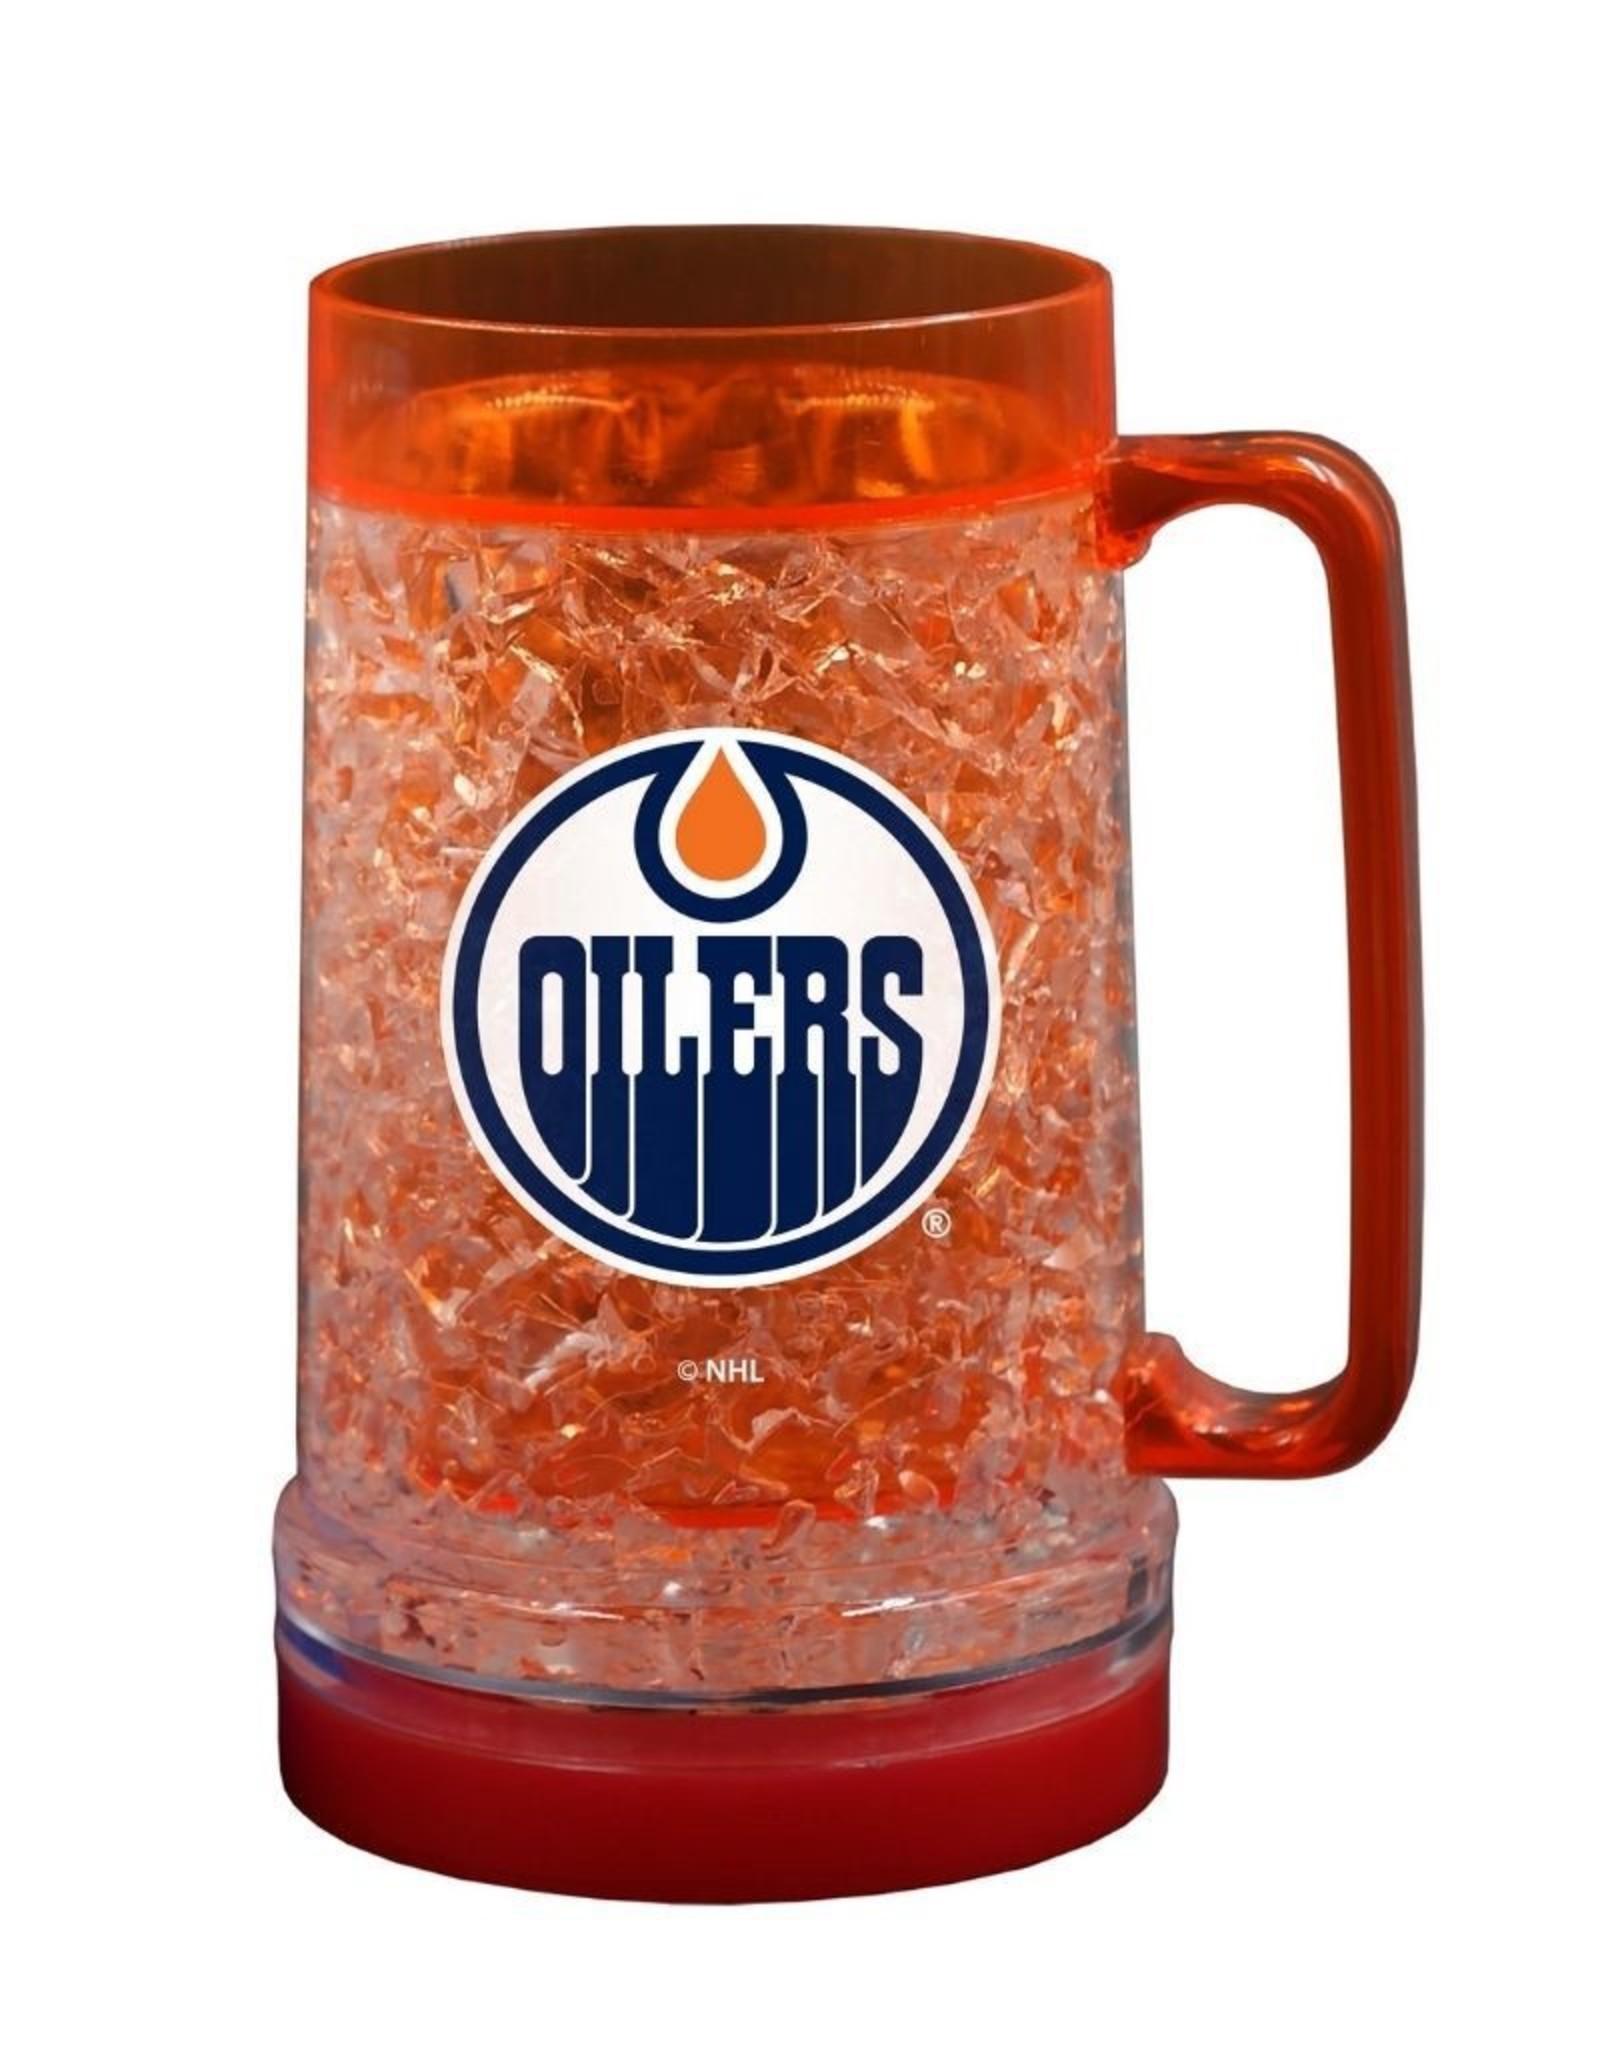 NHL Light Up Freezer Mug Oilers